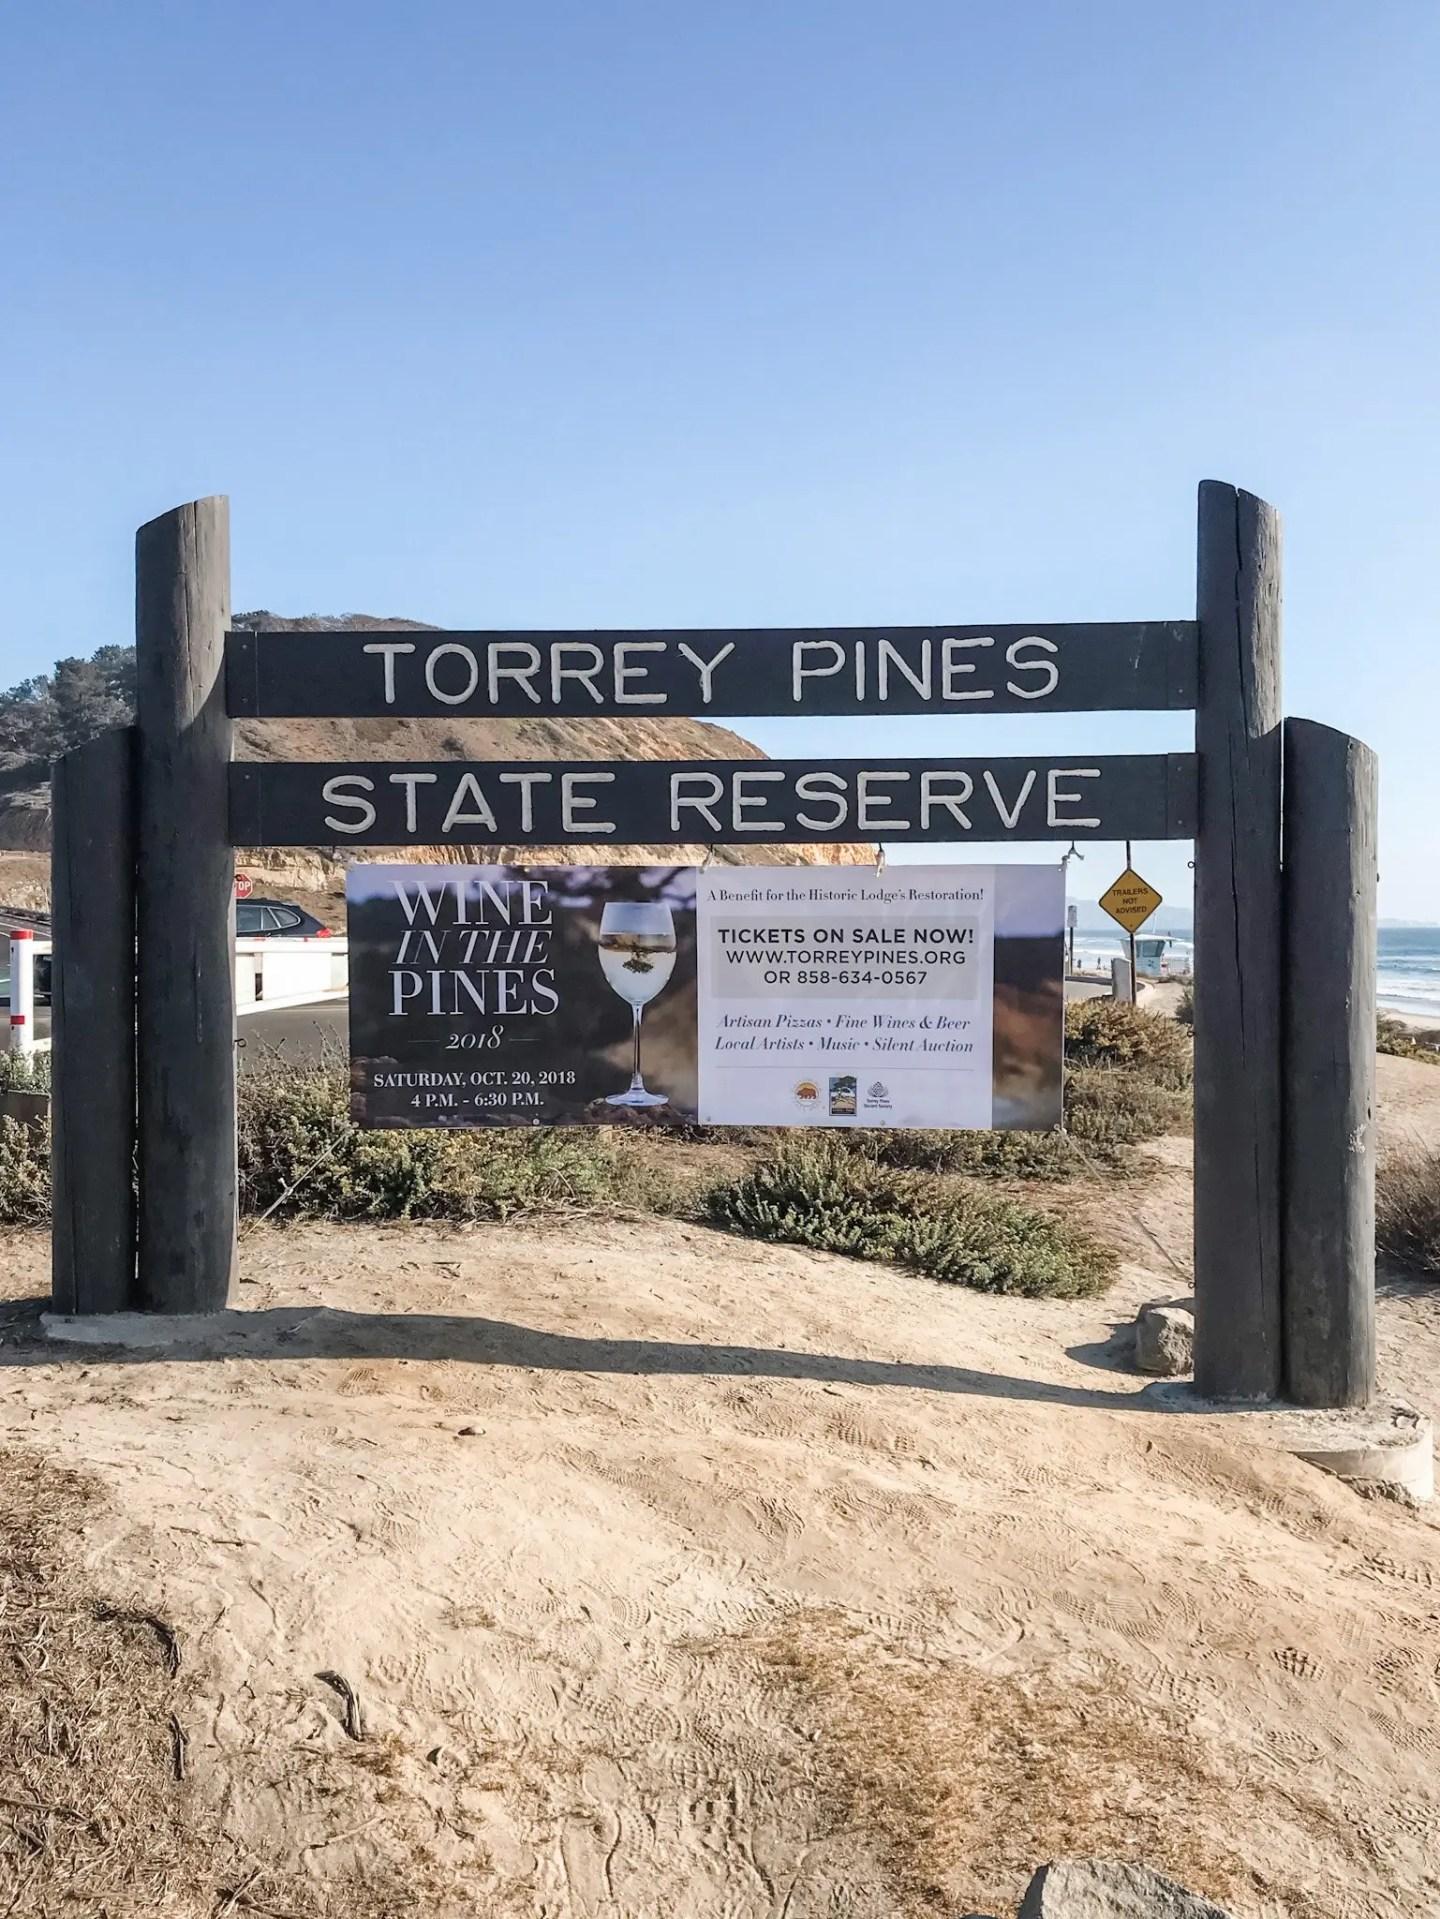 California Road Trip to San Diego. Torrey Pines State Reserve, San Diego